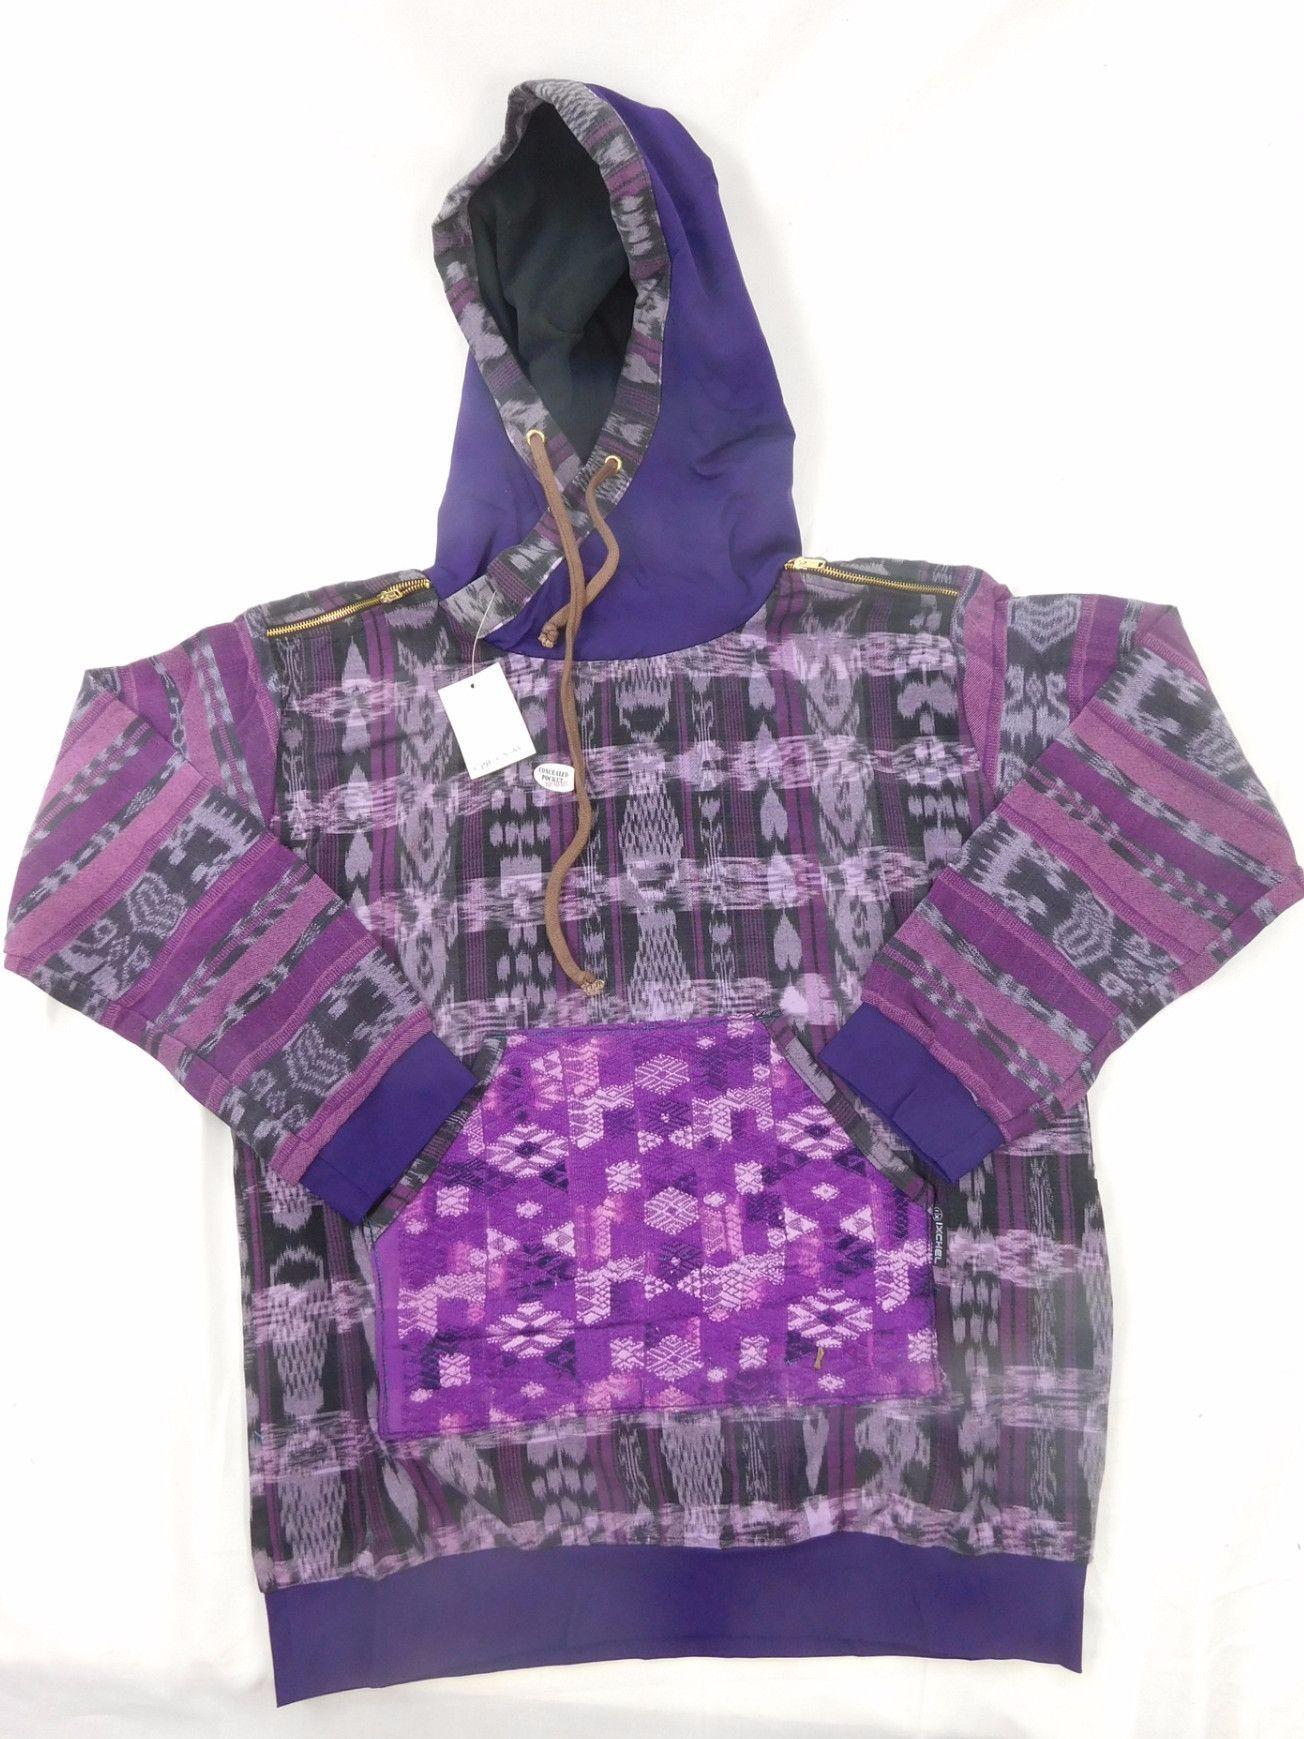 Hand woven cotton hoodie street wear styled